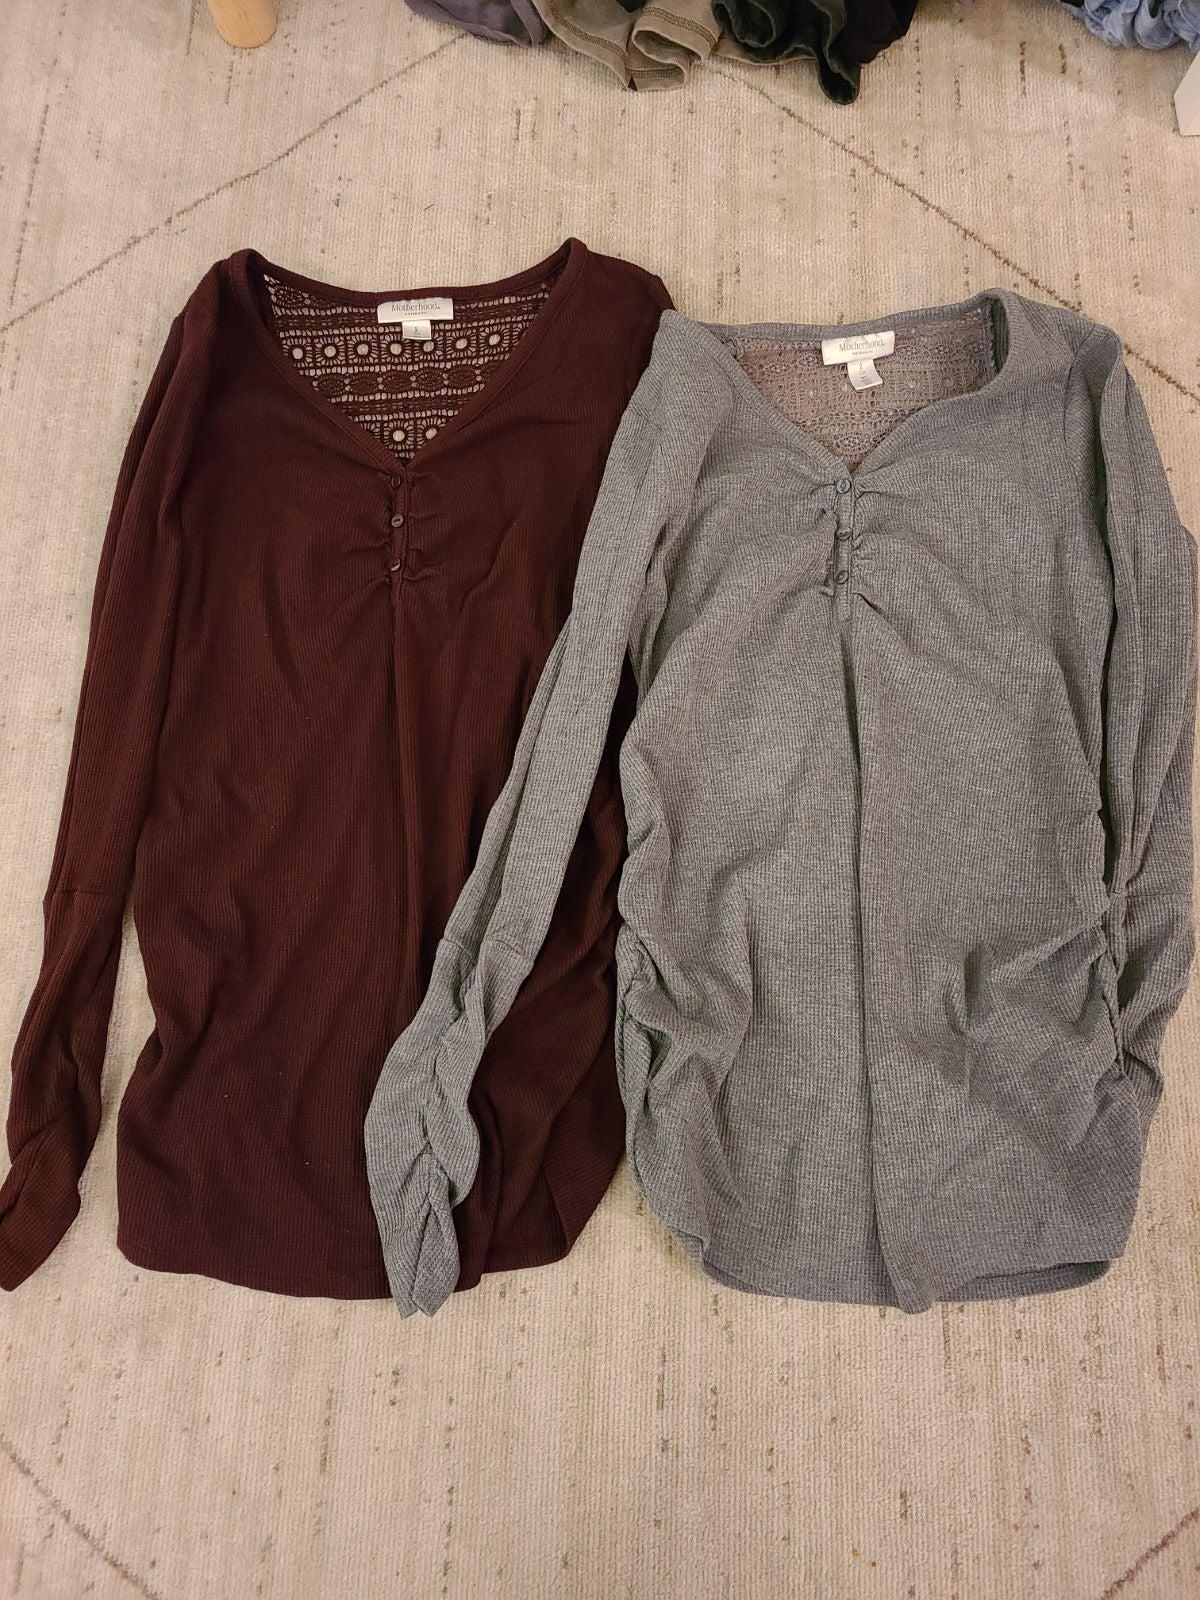 Maternity Long Sleeve shirts bundle